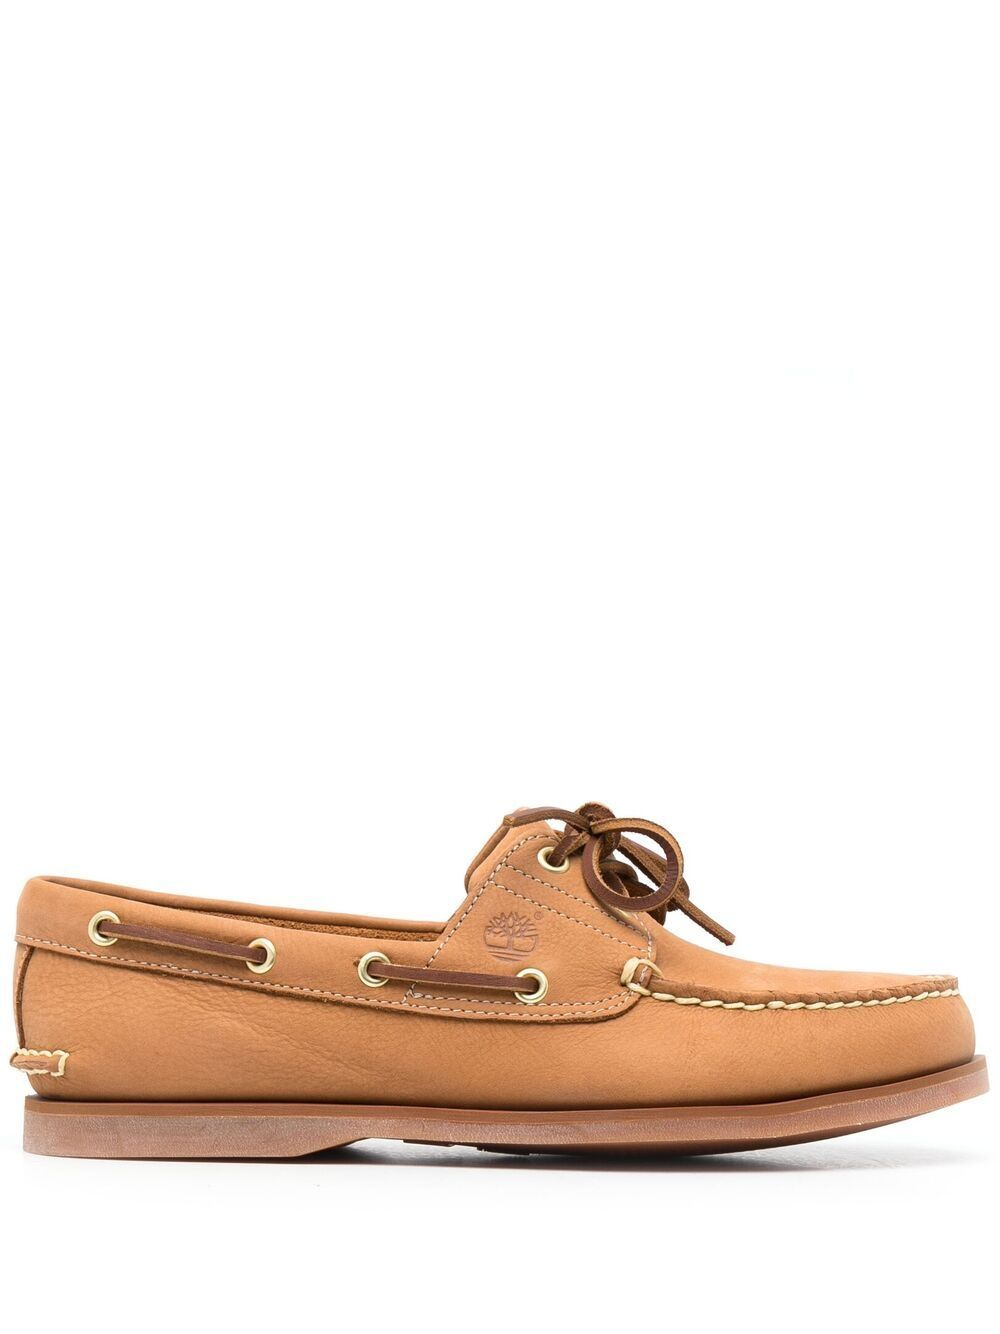 Timberland scarpe basse beige